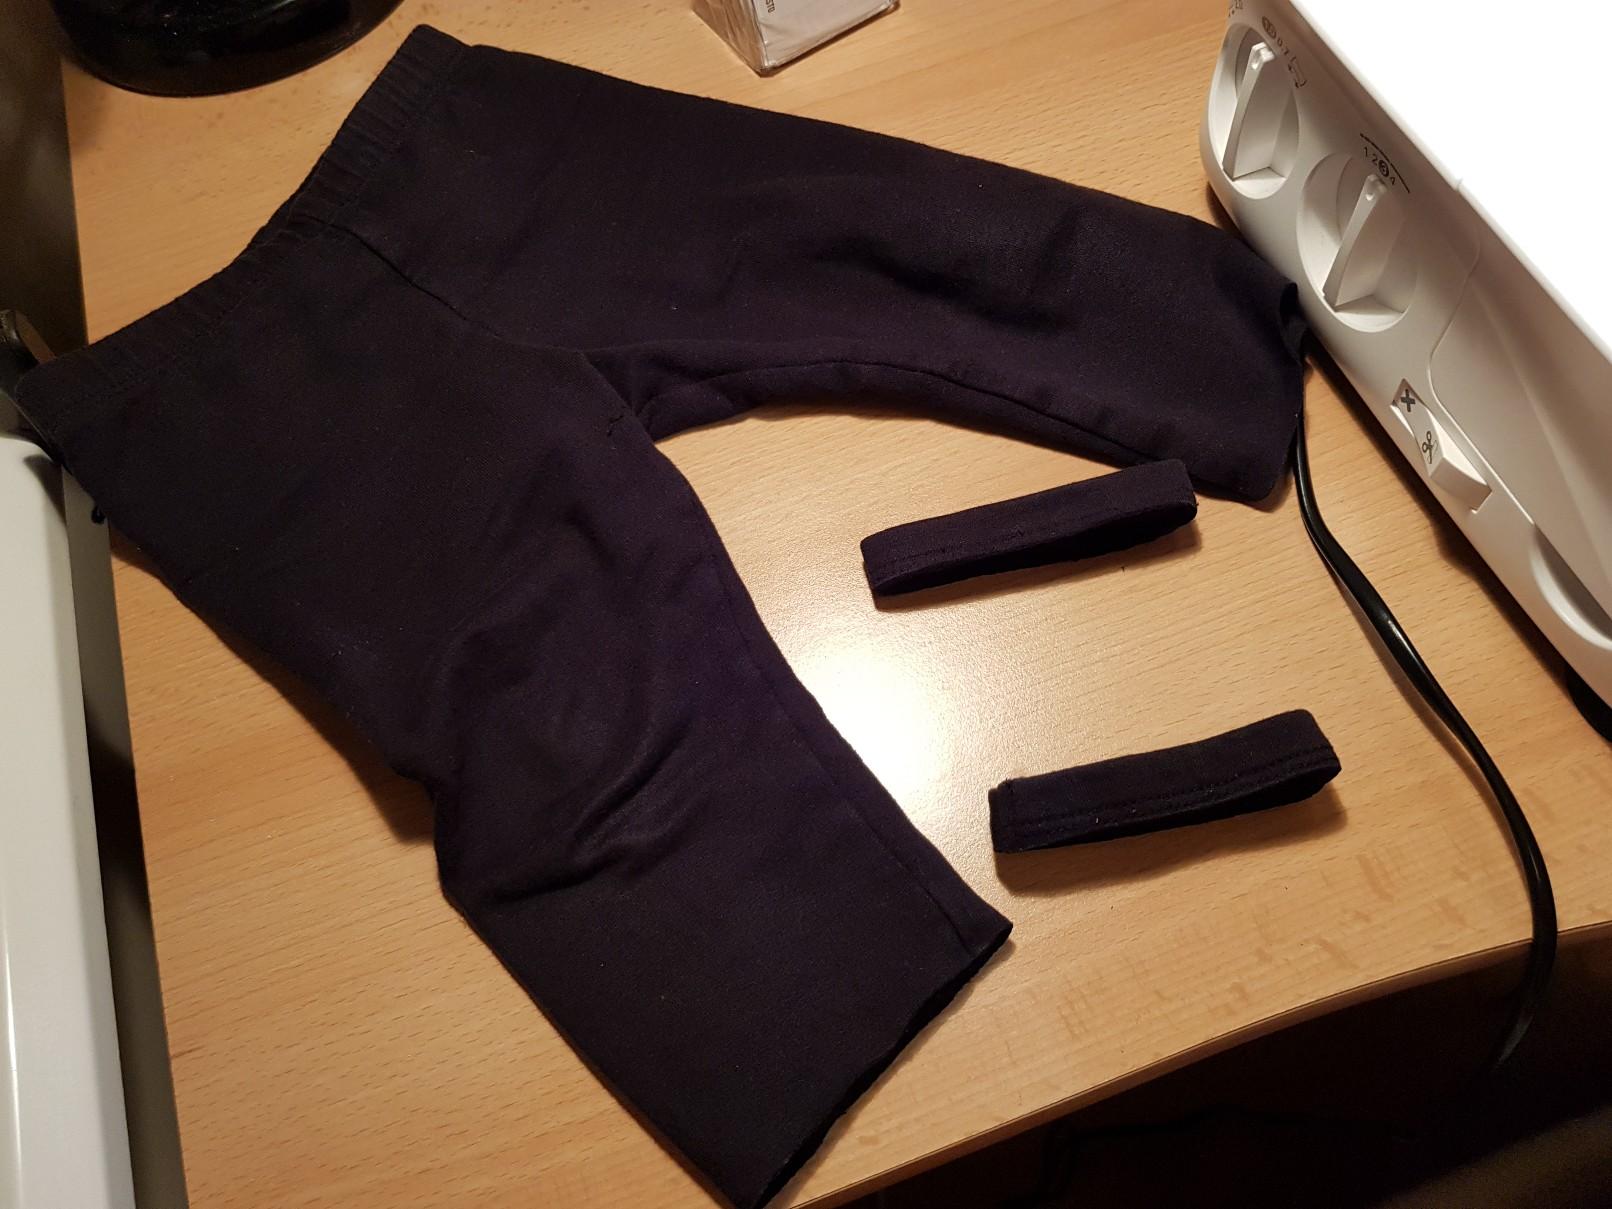 lengthened leggings prepare